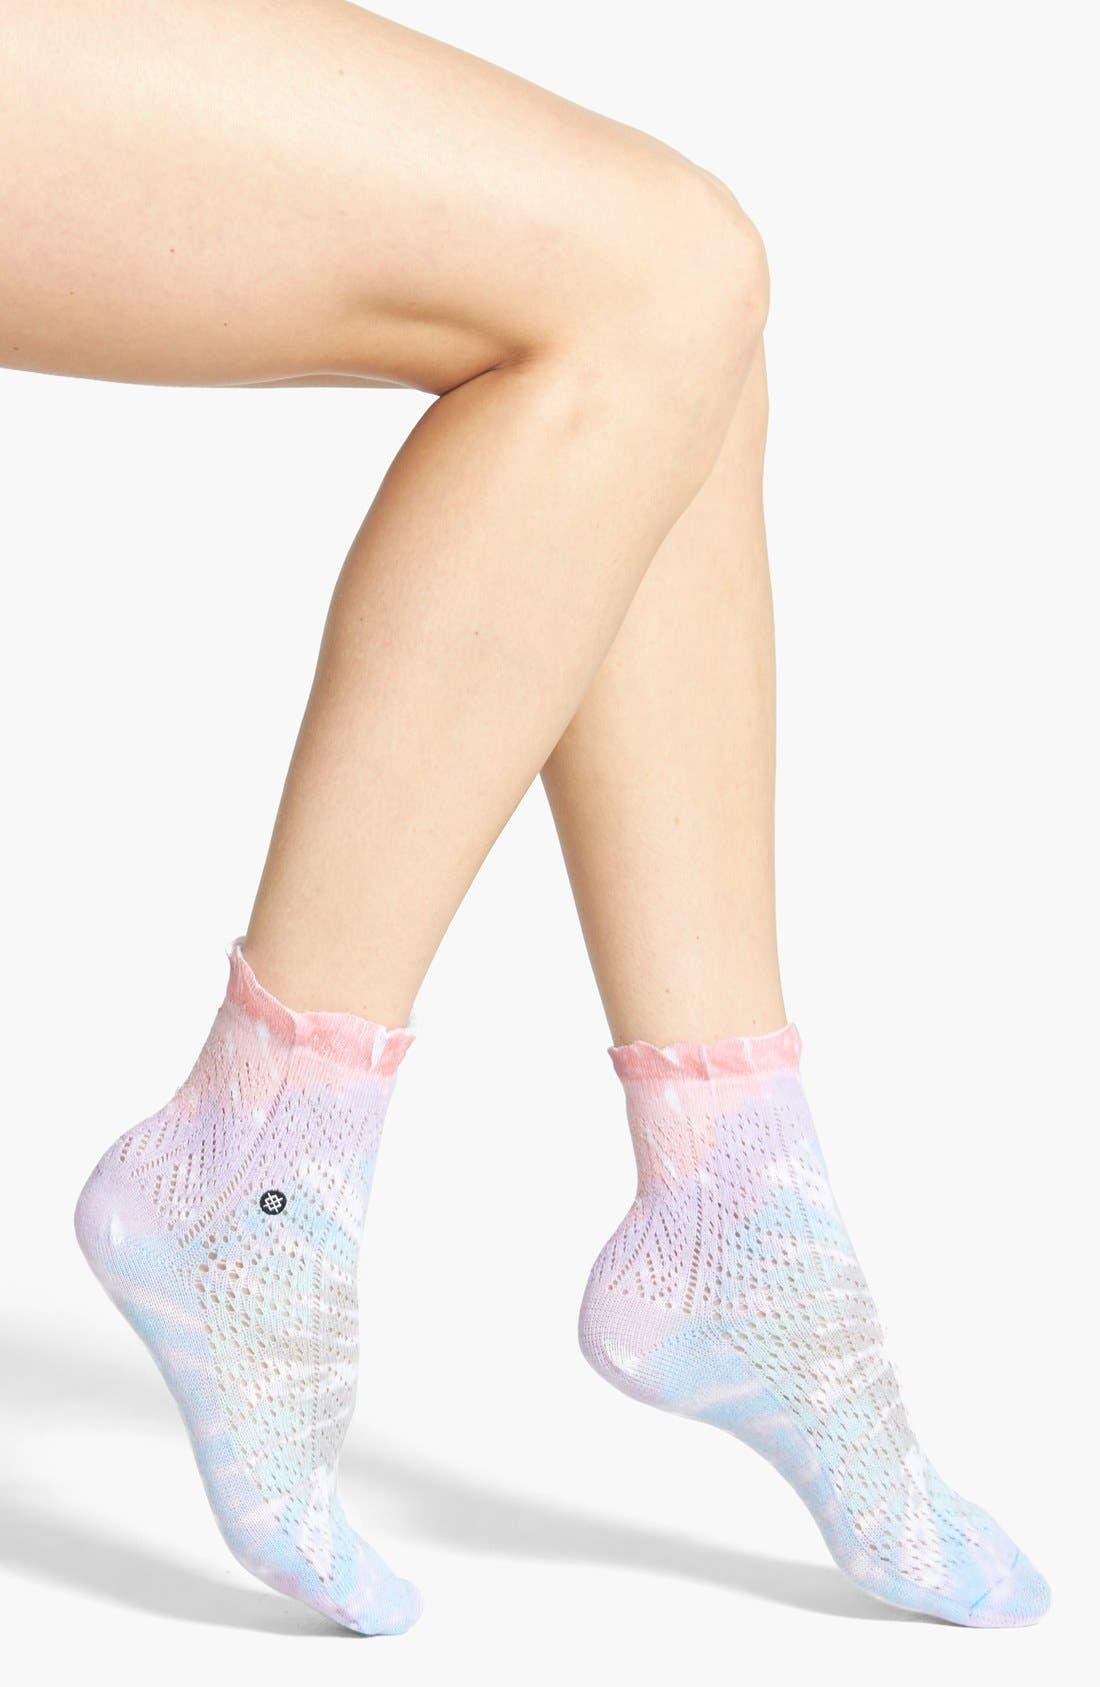 'Chloe' Tie-Dye Ankle Socks,                             Main thumbnail 1, color,                             530